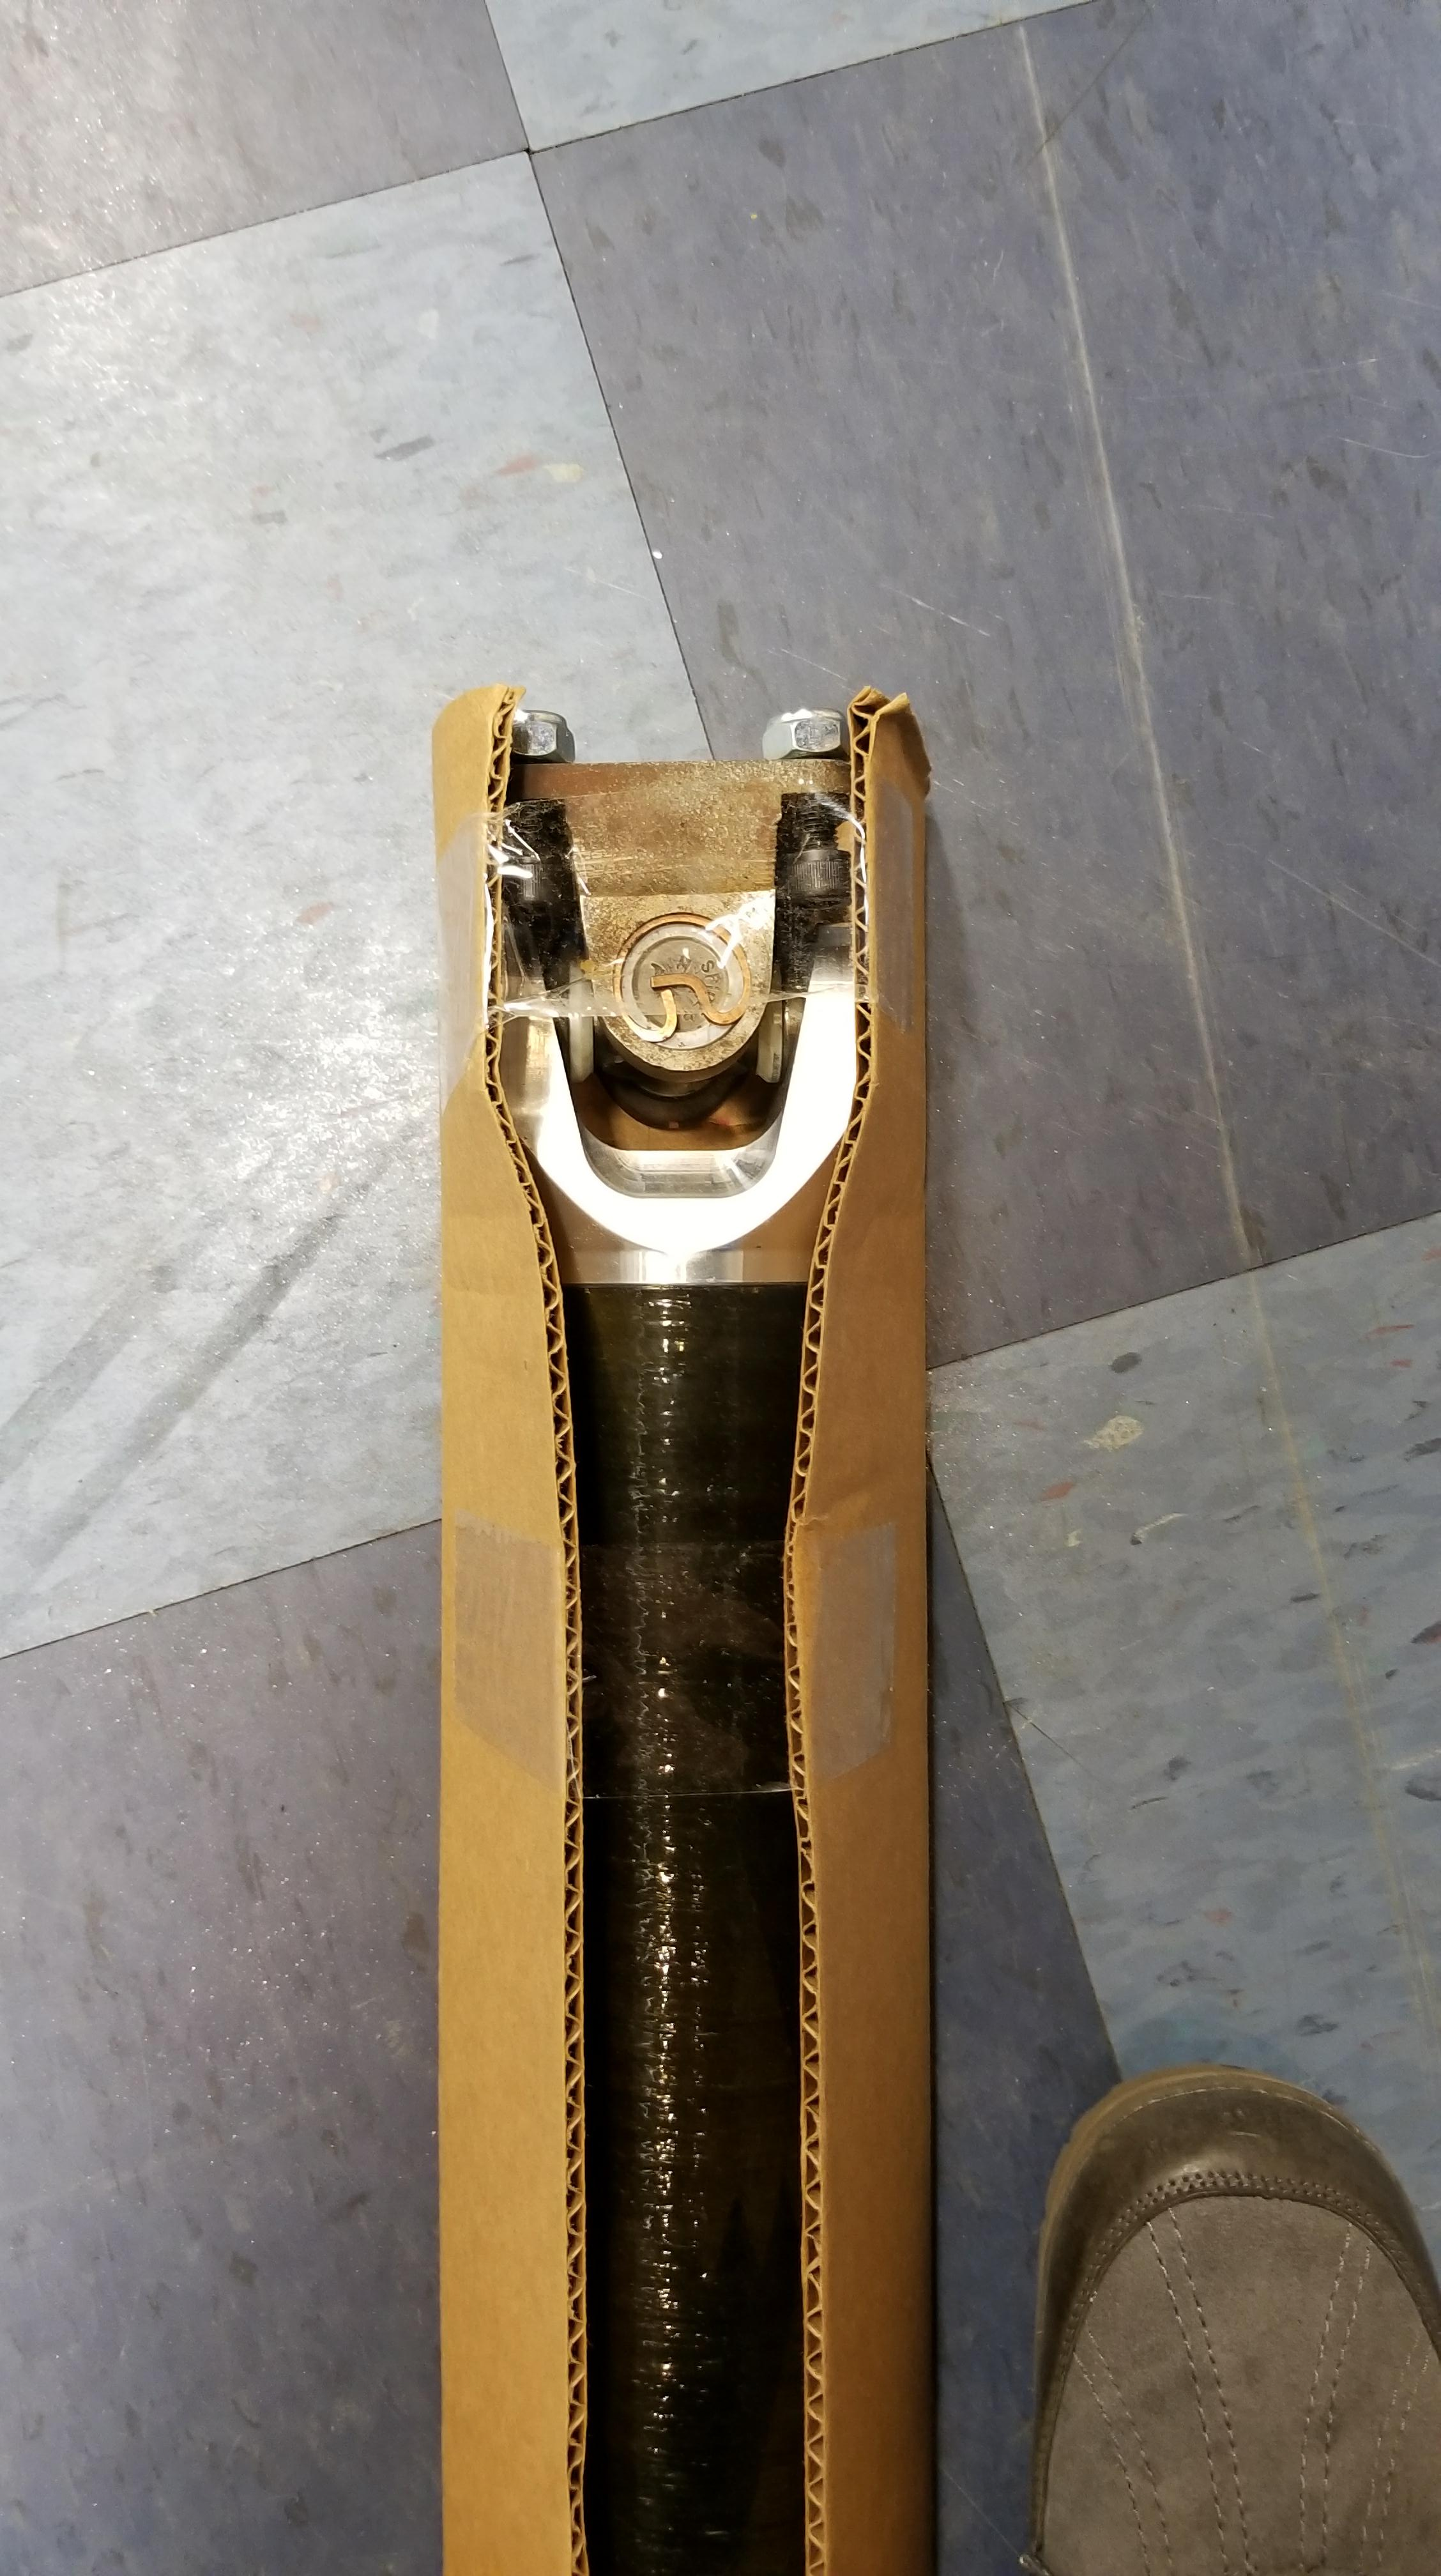 Brand new Driveshaft Shop carbon fiber driveshaft-received_4214787765210_1514495156632-jpeg